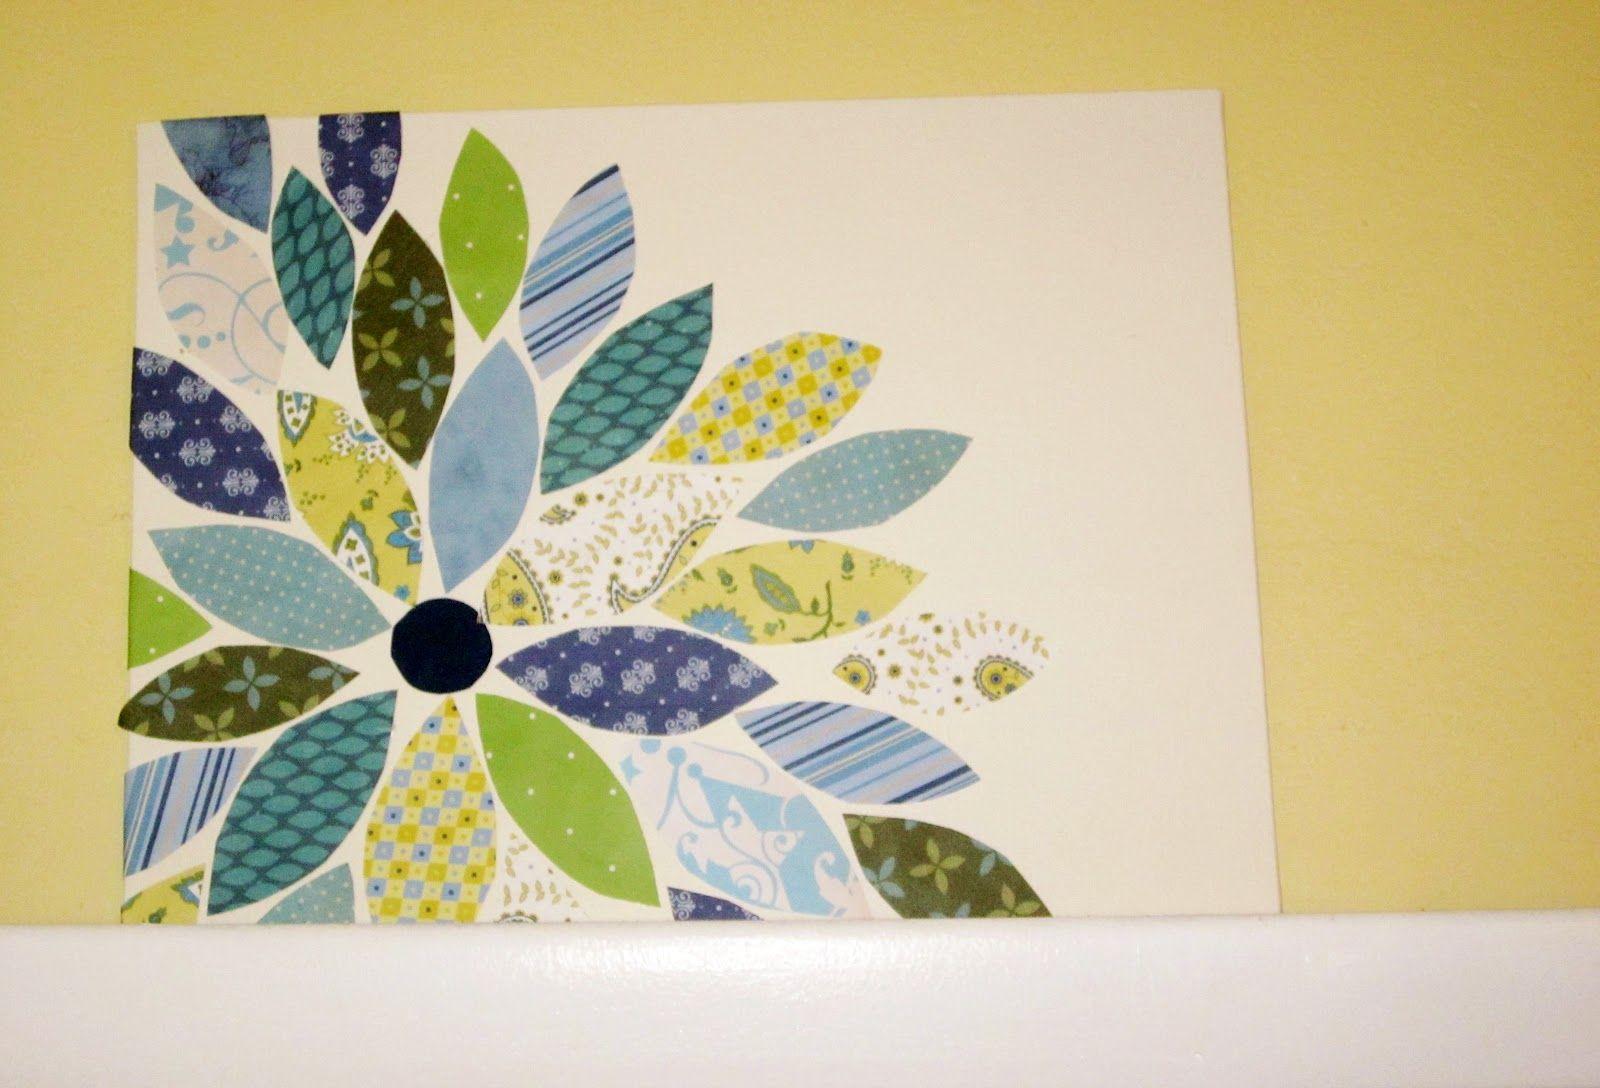 Enchanting Diy Wall Decor Scrapbook Paper Composition - Wall Art ...